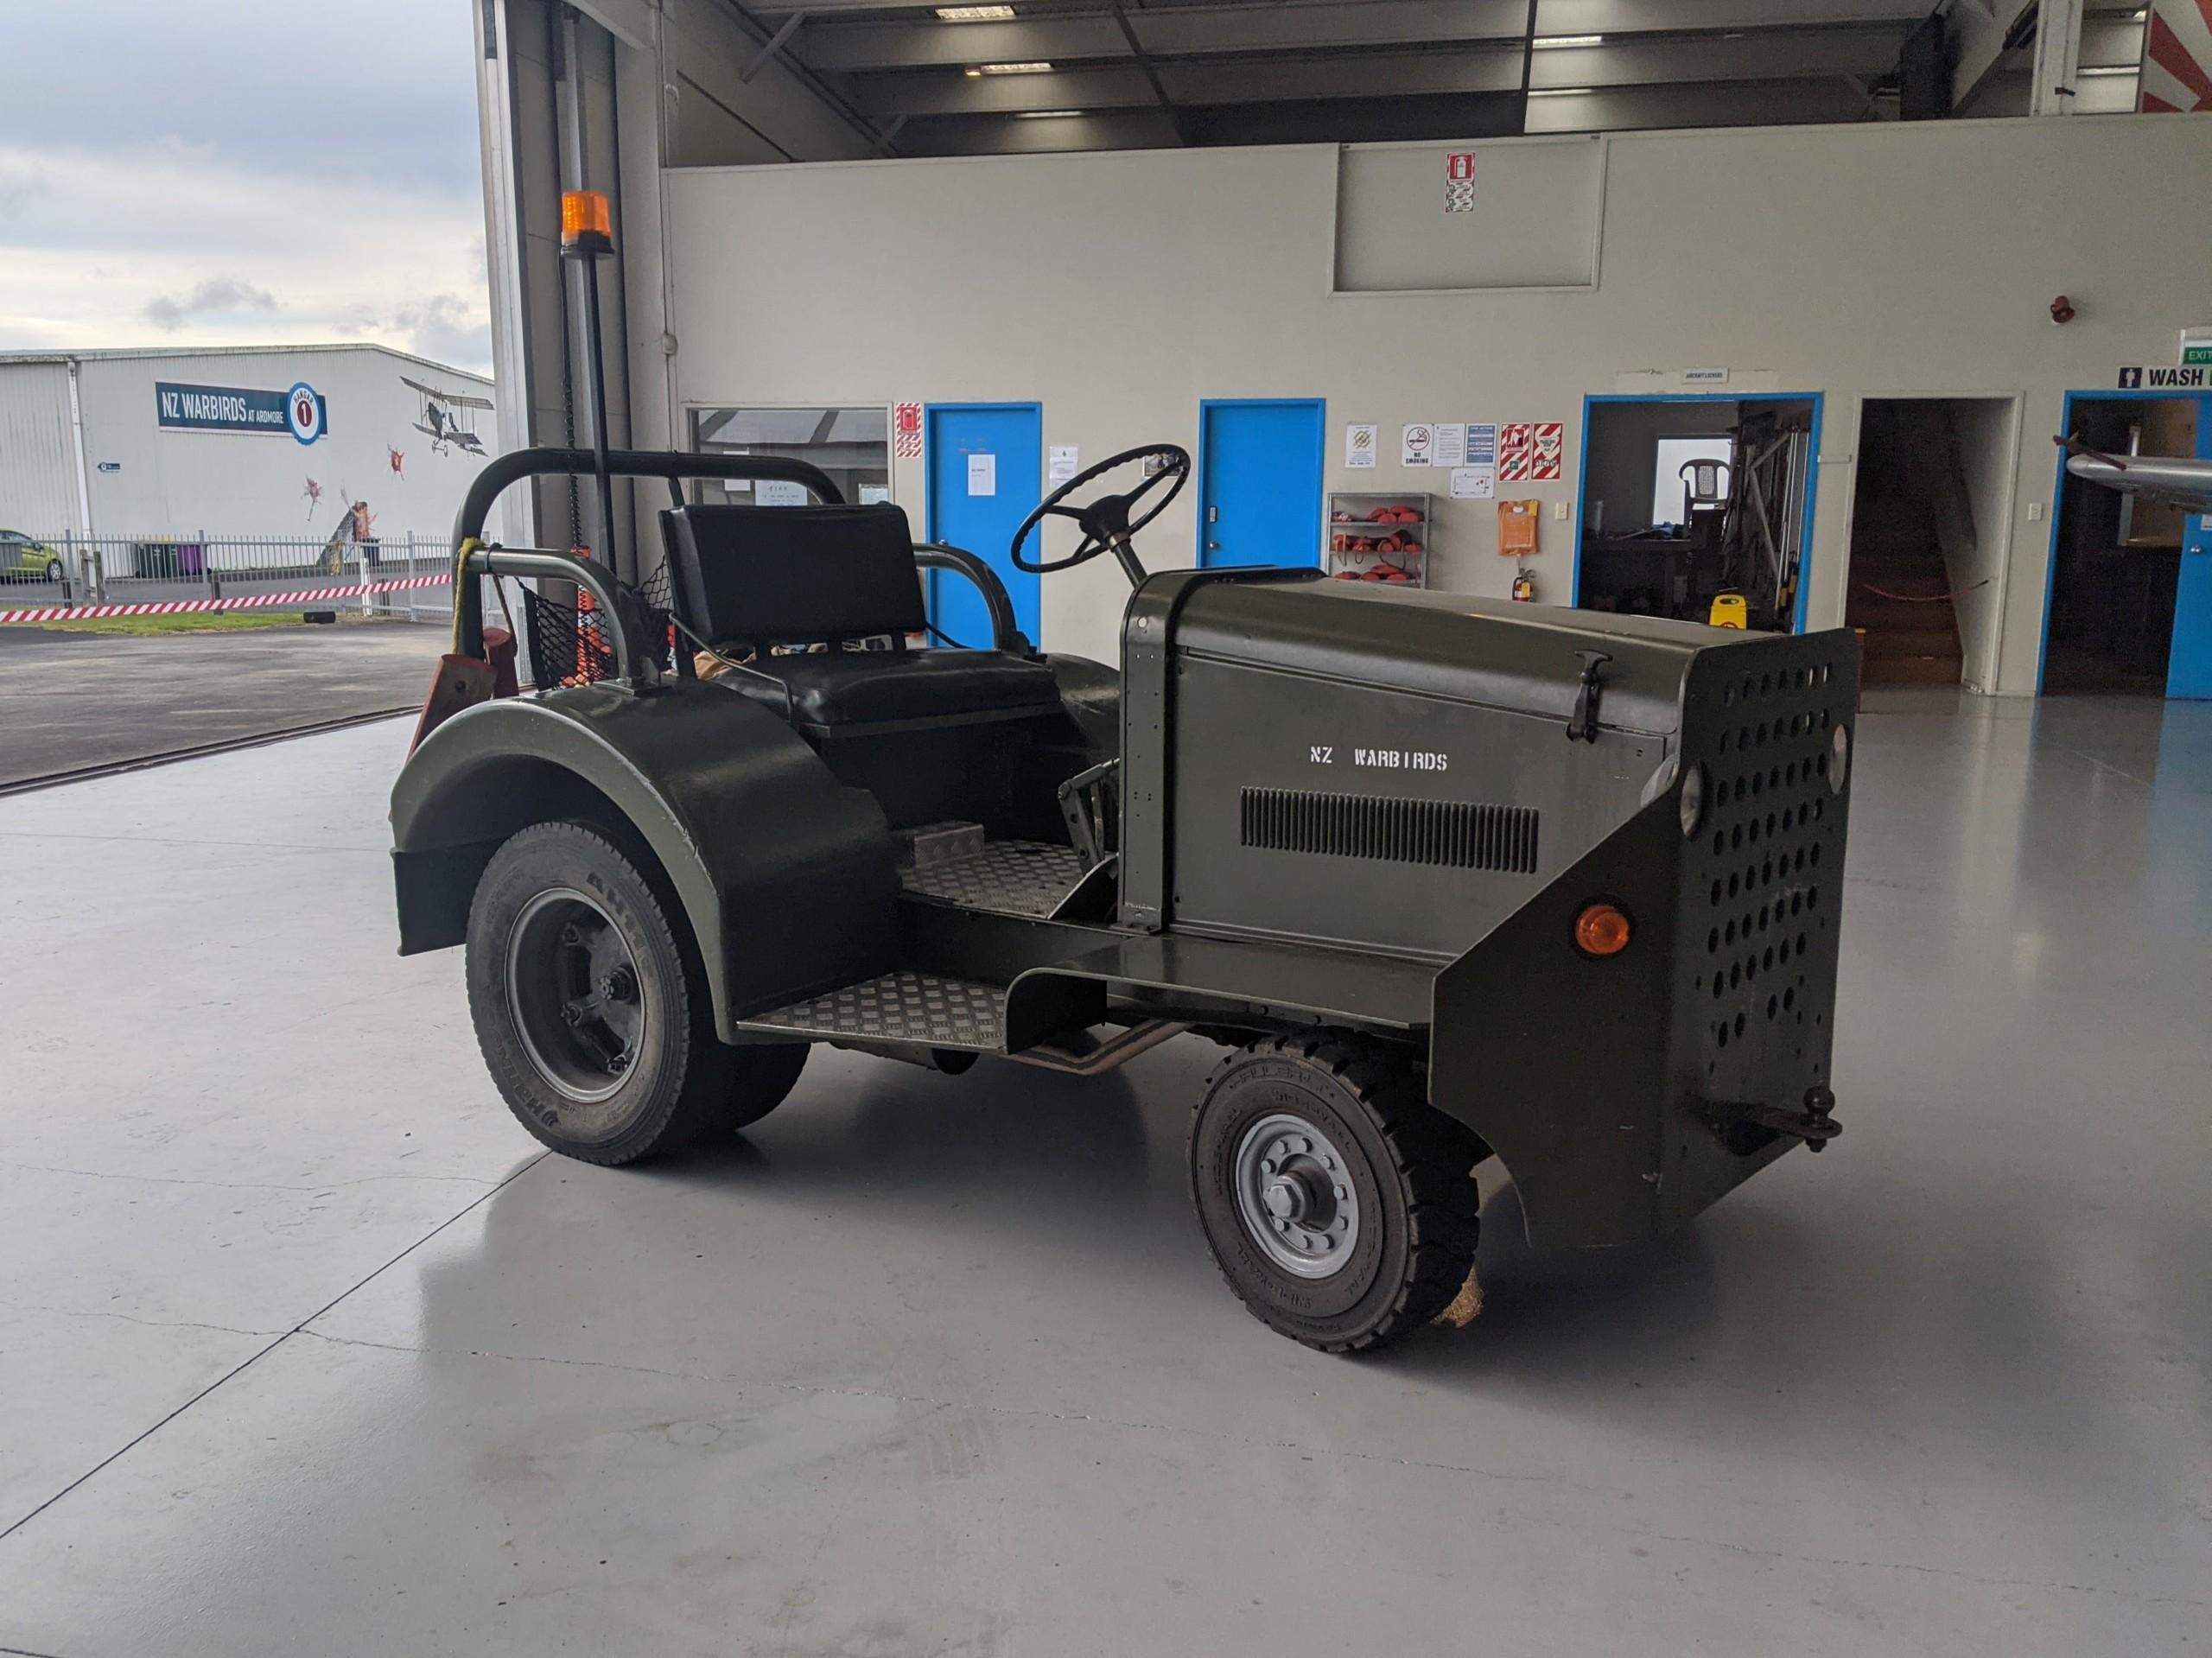 Clark Airfield Tractor - NZ Warbirds